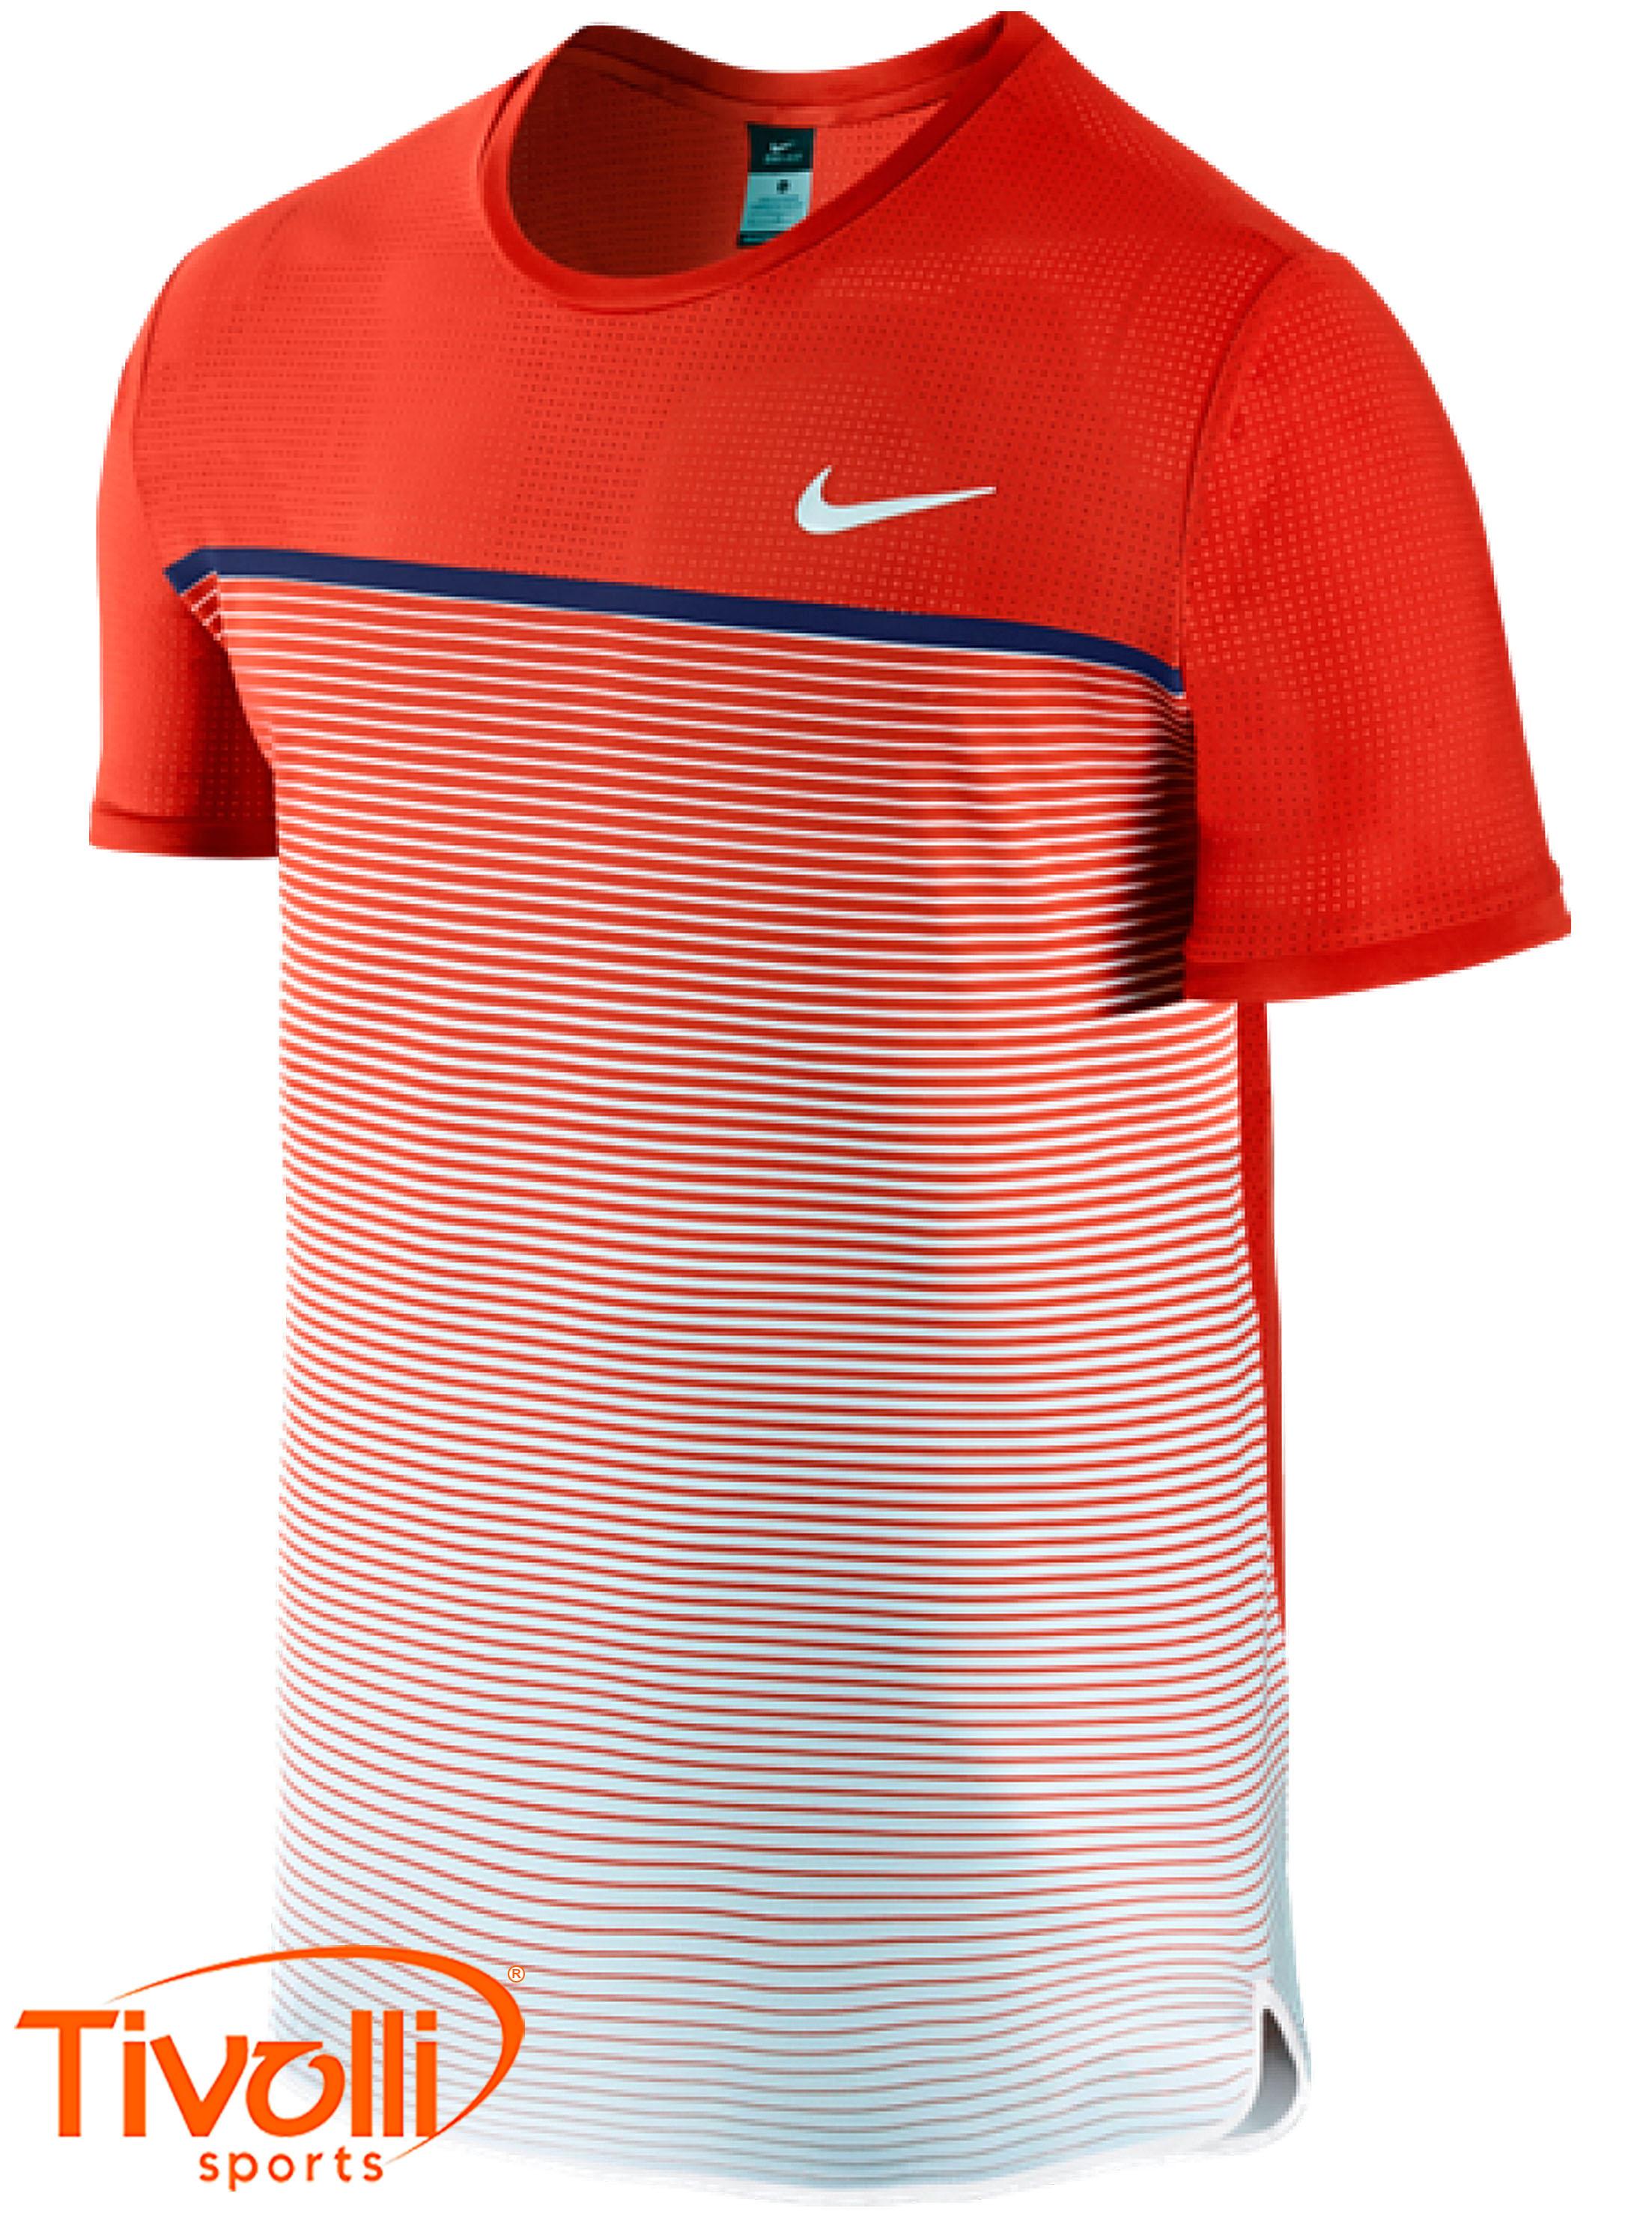 dbdecefe8335c Raquete Mania   Camiseta Nike   Challenger Premier Crew Vermelha ...